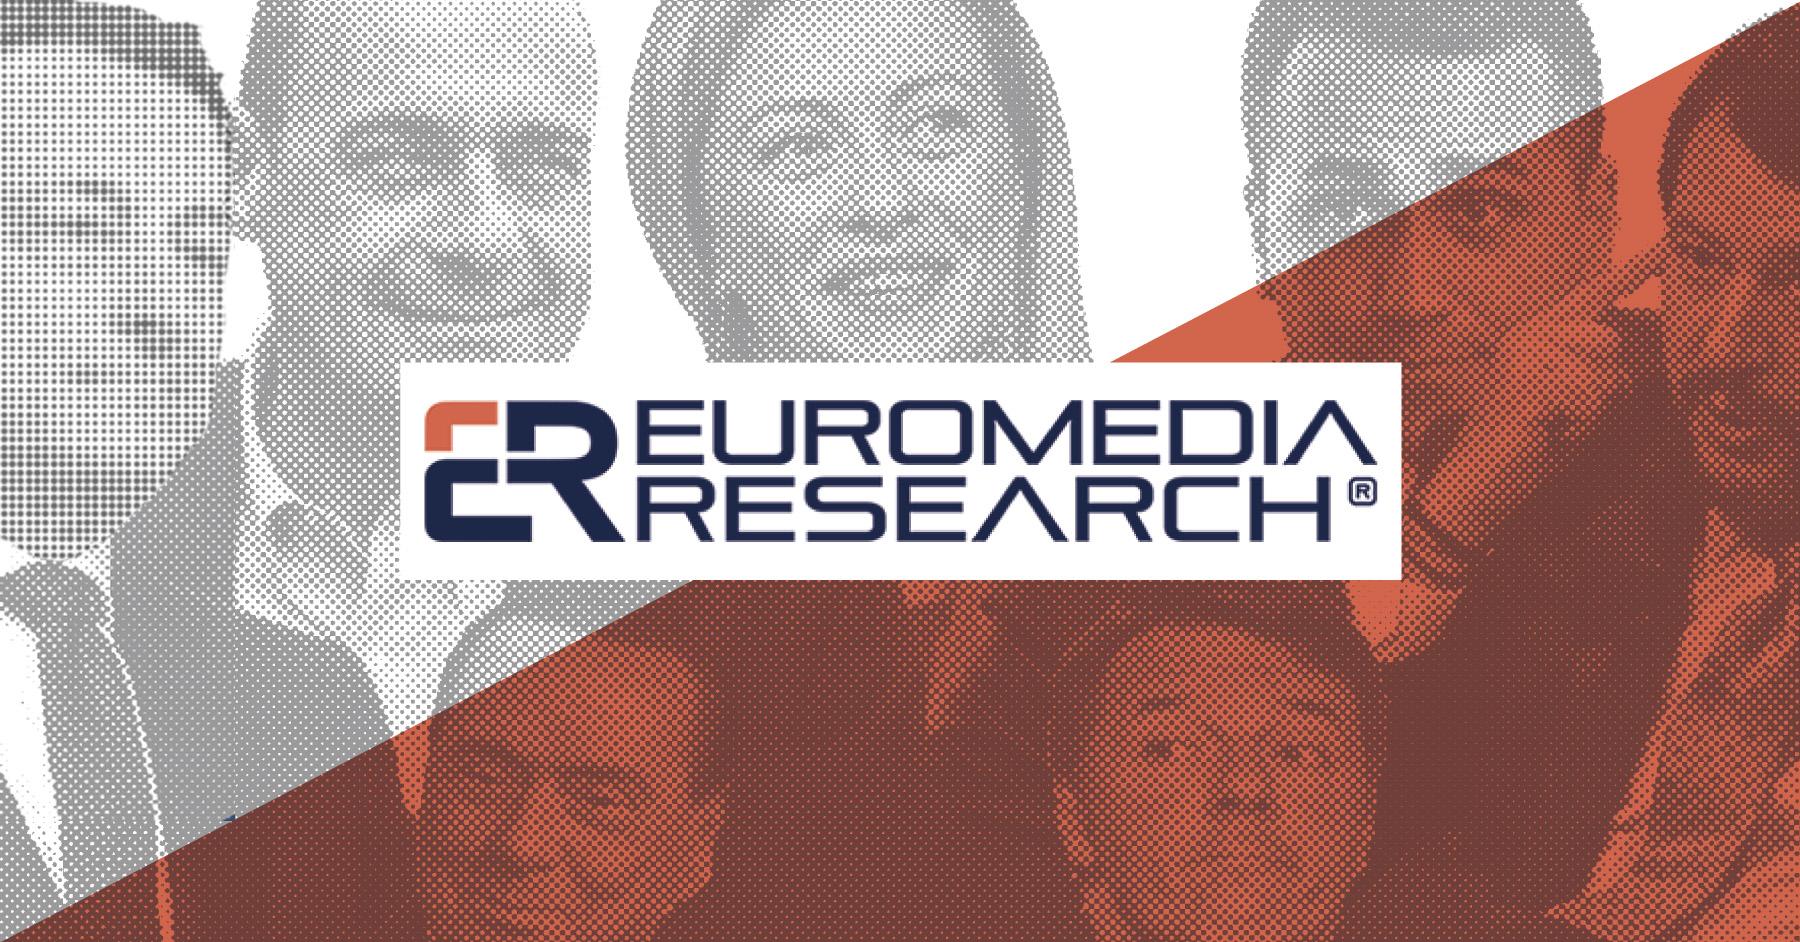 ultimi sondaggi elettorali euromedia, sondaggi politici euromedia, ultimi sondaggi euromedia